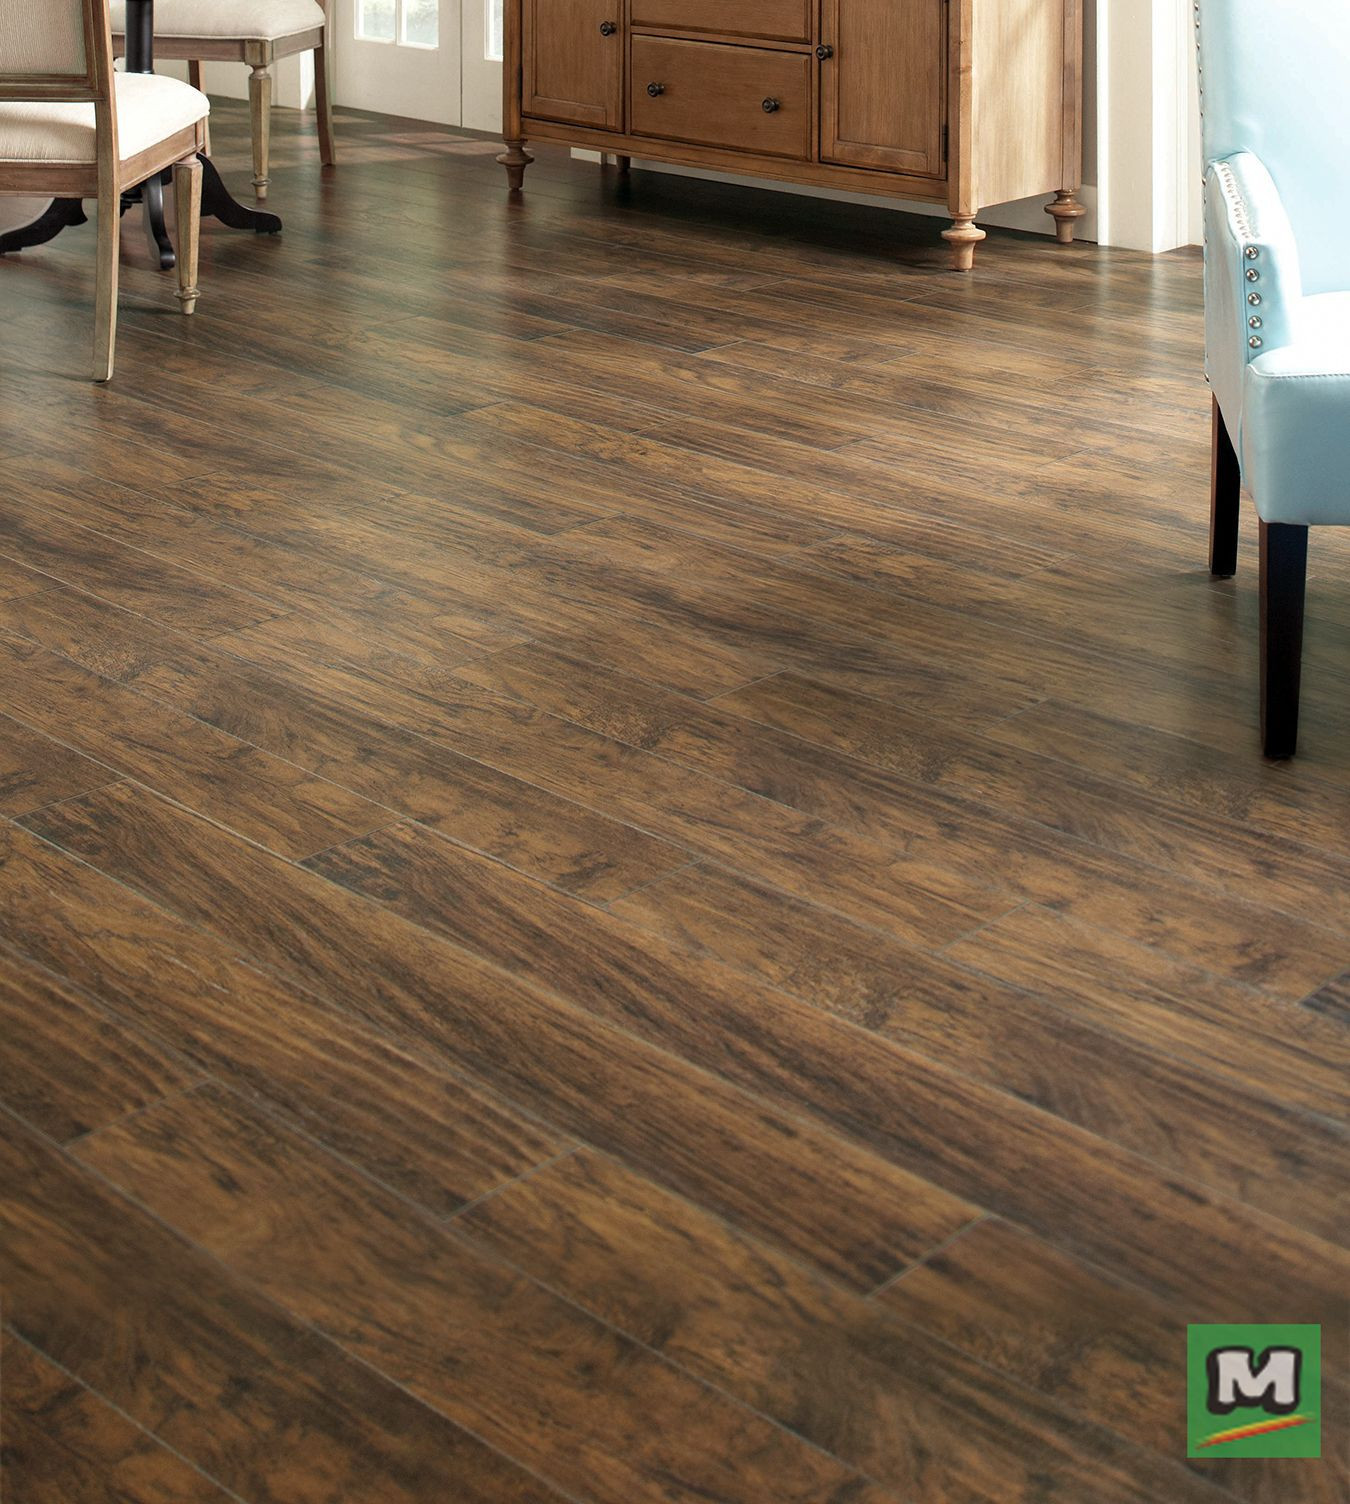 21 Lovely Mohawk Hickory Hardwood Flooring 2021 free download mohawk hickory hardwood flooring of mohawk laminate flooring wood like laminate flooring rustic legacy in mohawk laminate flooring monroe park hickory laminate flooring features a realistic